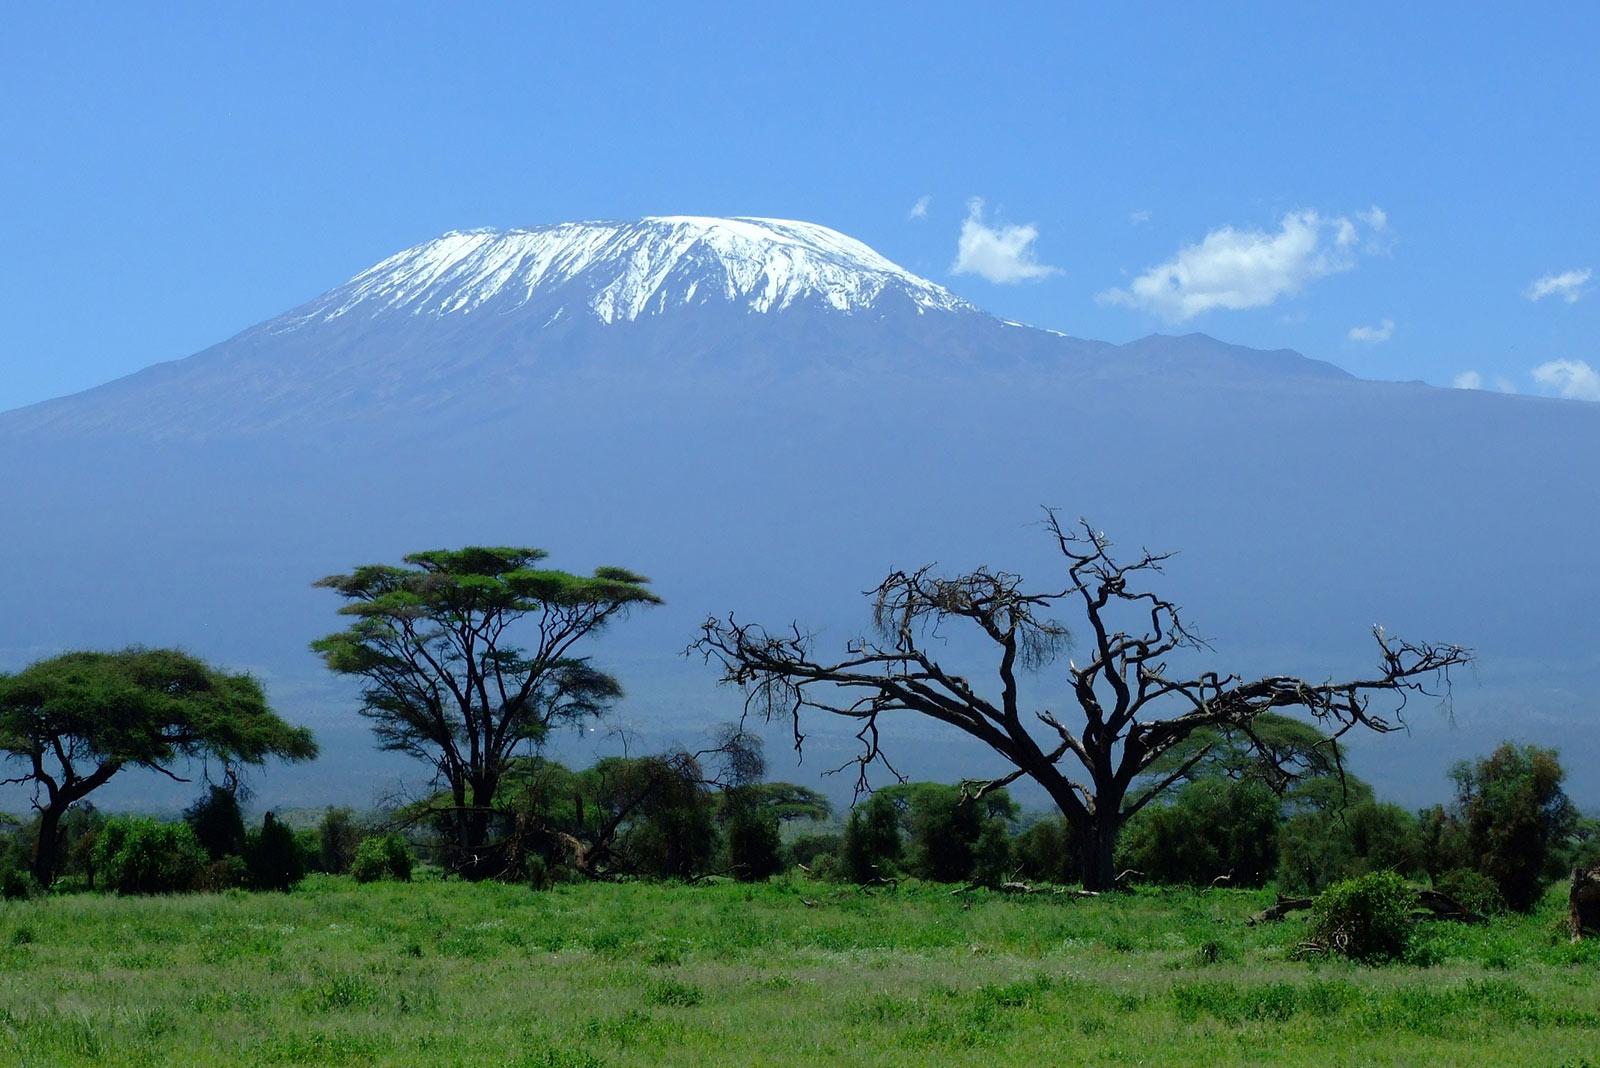 Mount Kilimanjaro Safari